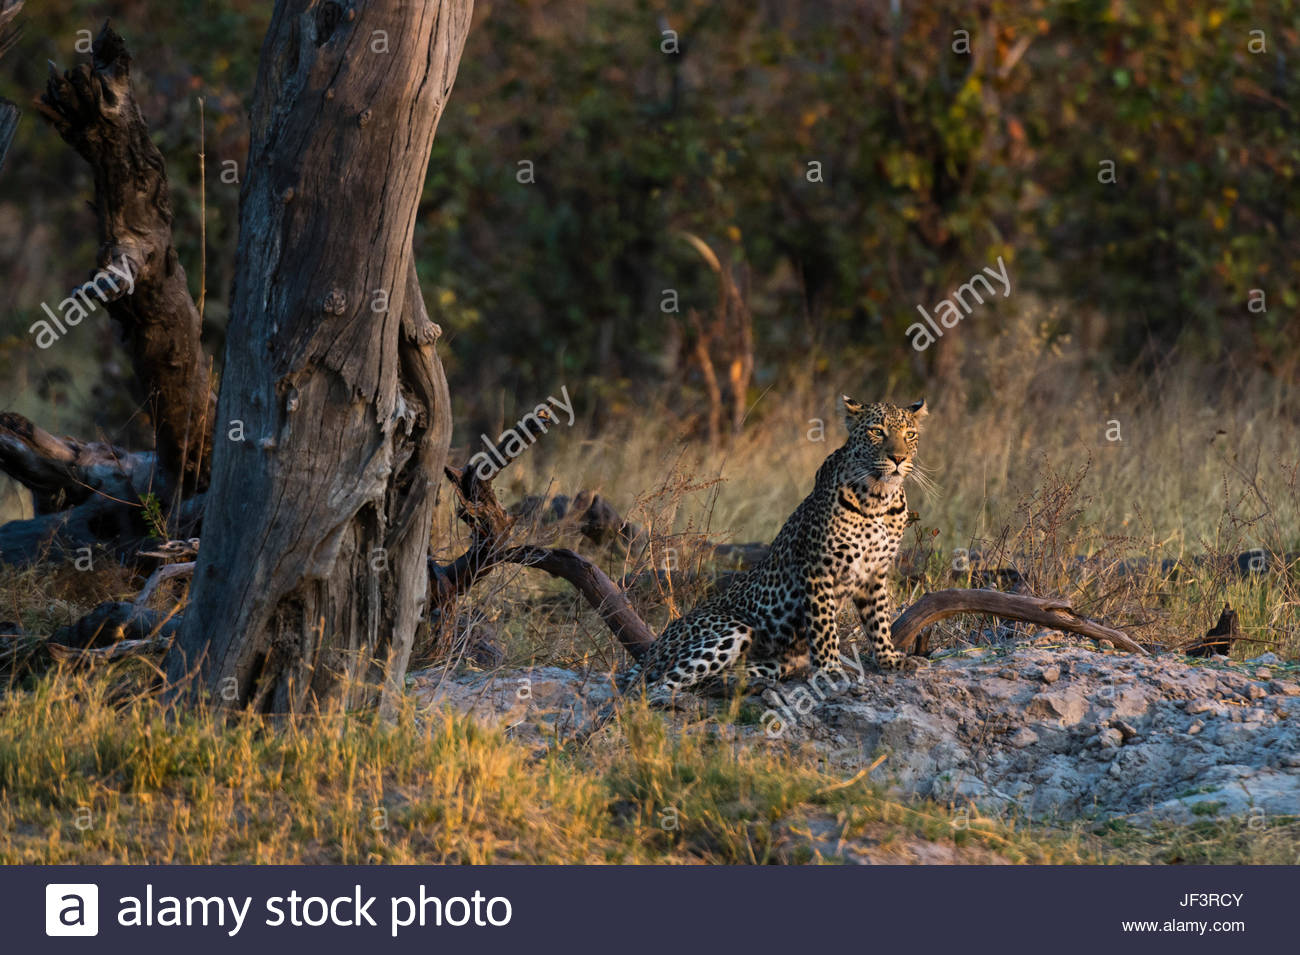 A leopard, Panthera pardus, resting near a dead tree. - Stock Image